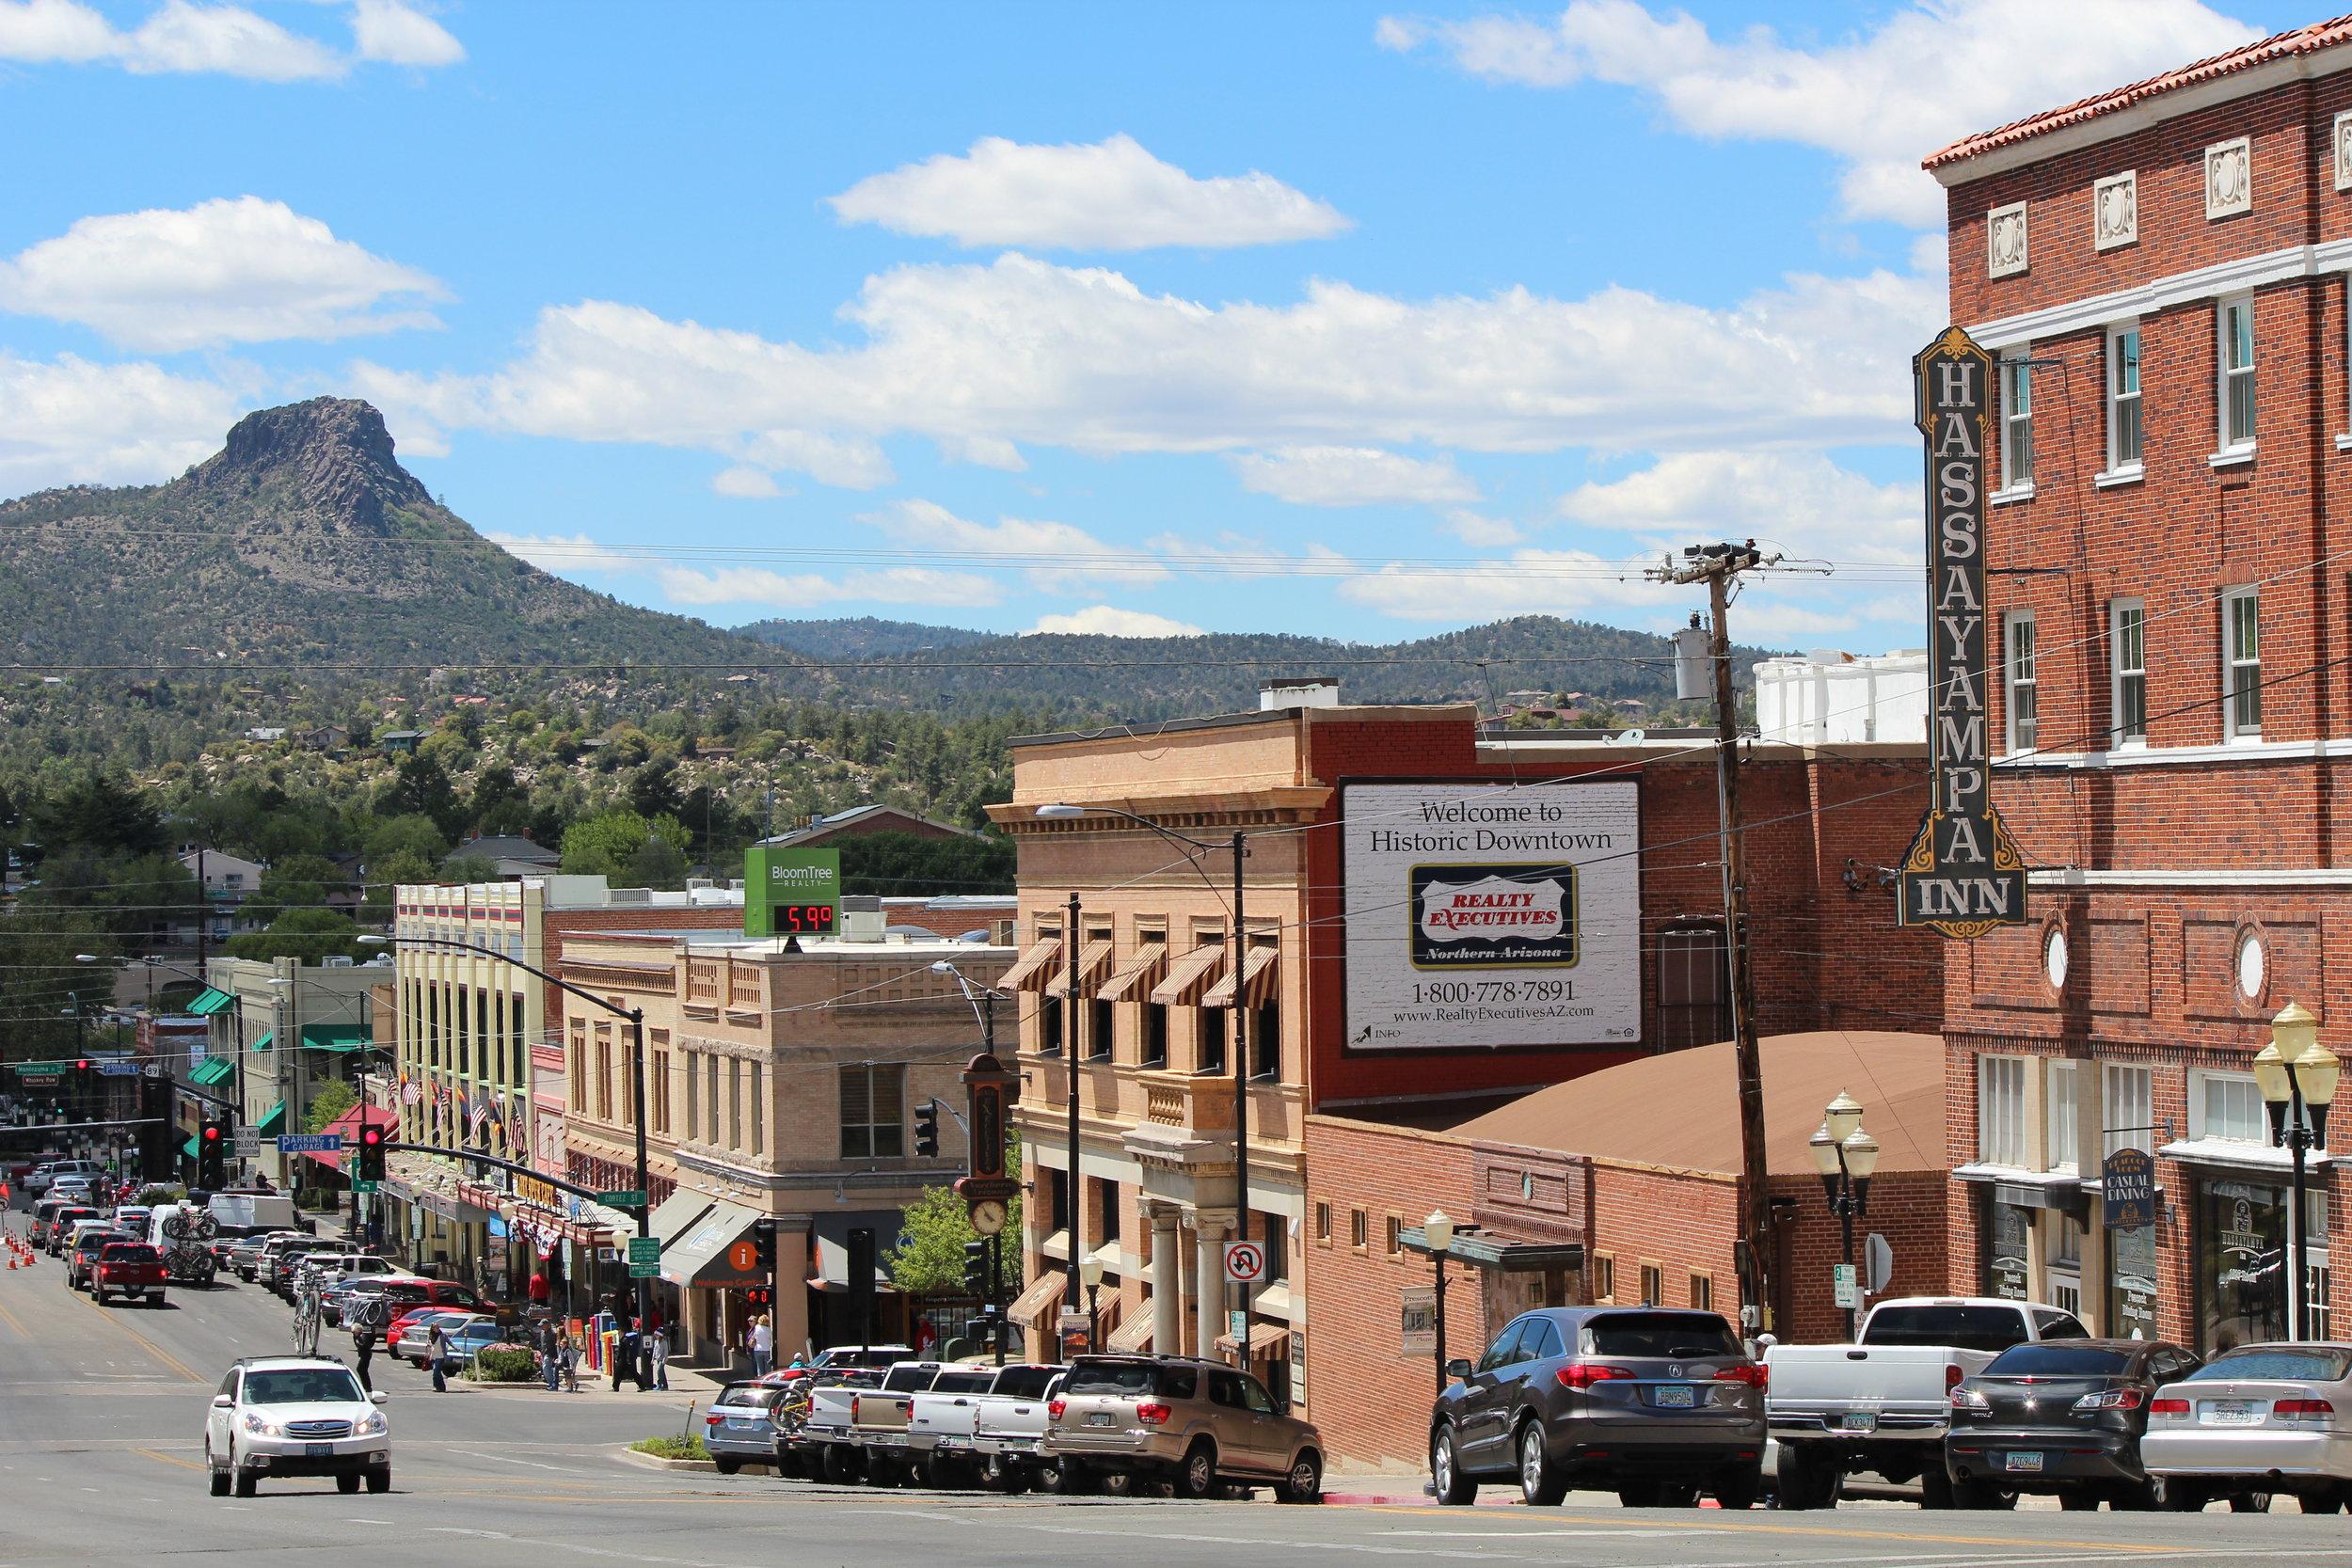 Thumb Butte in Prescott